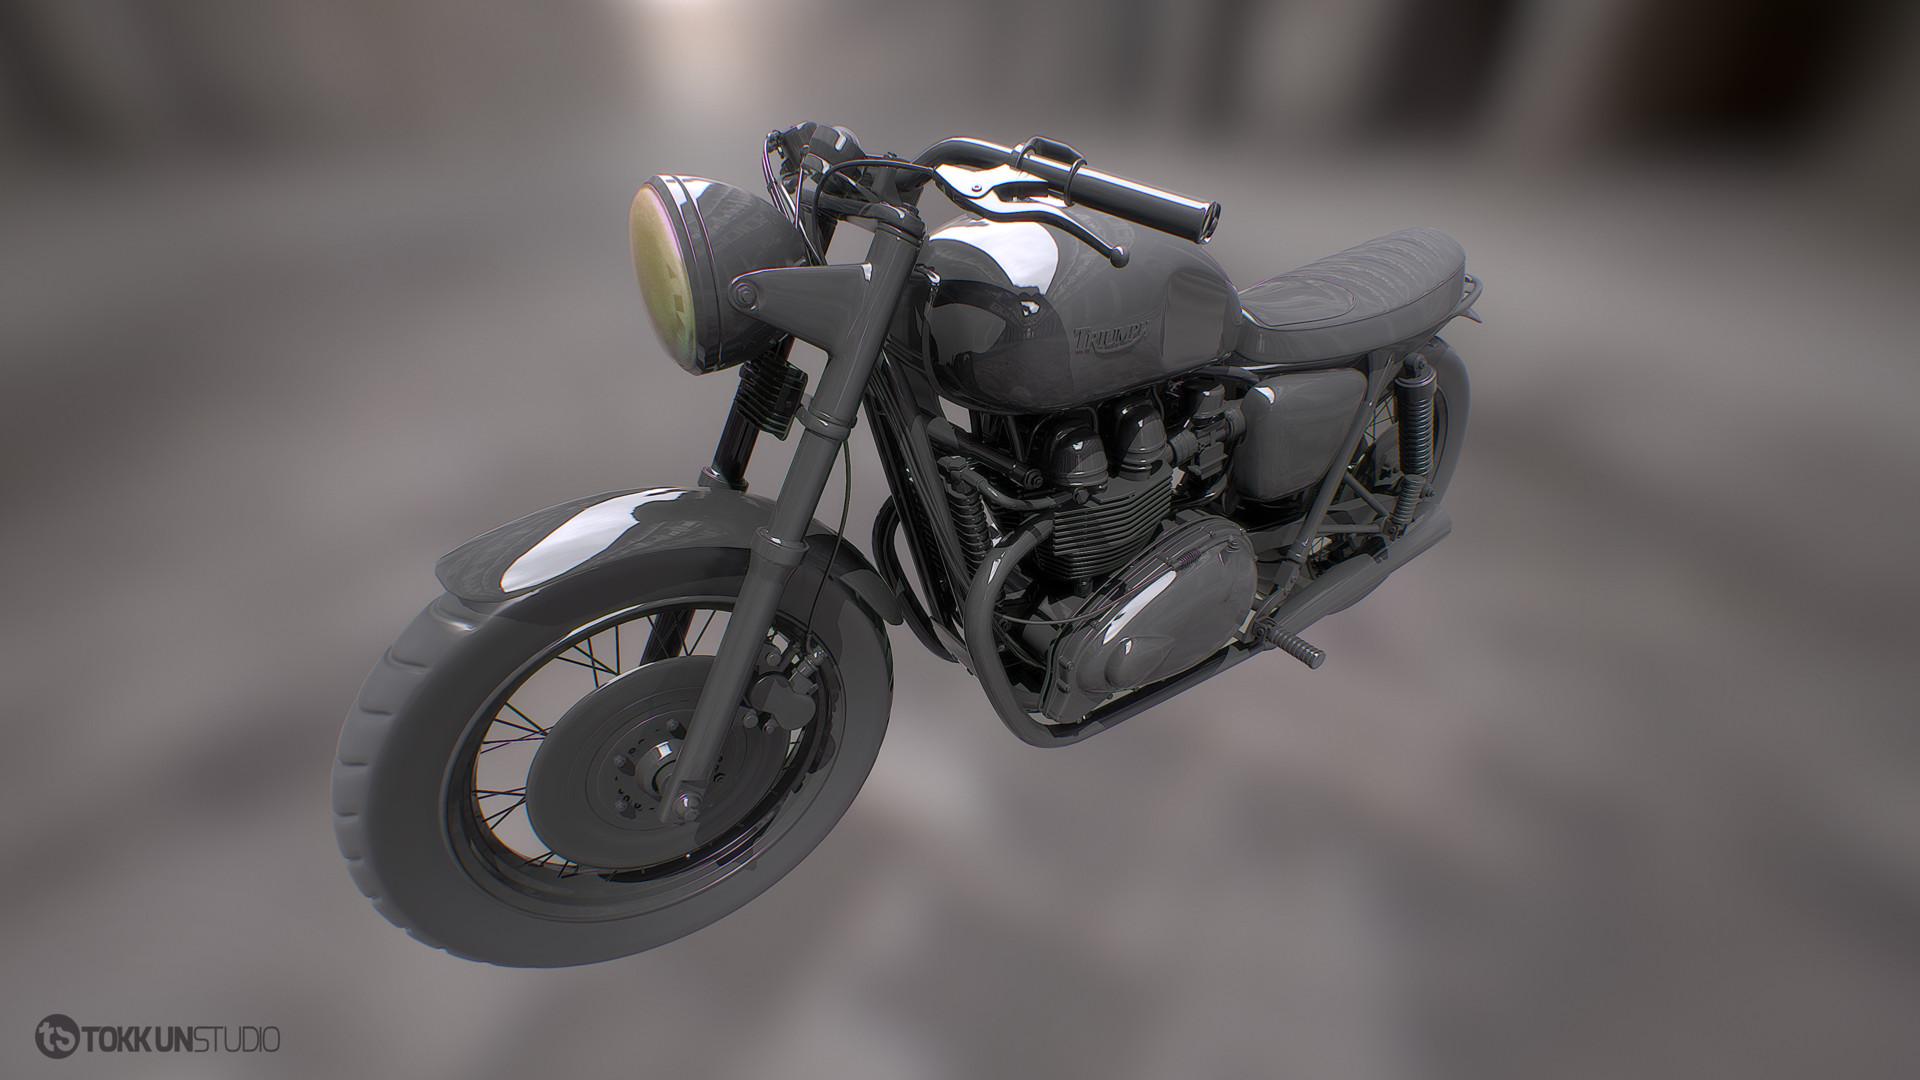 Tokkun studio bike 1ts